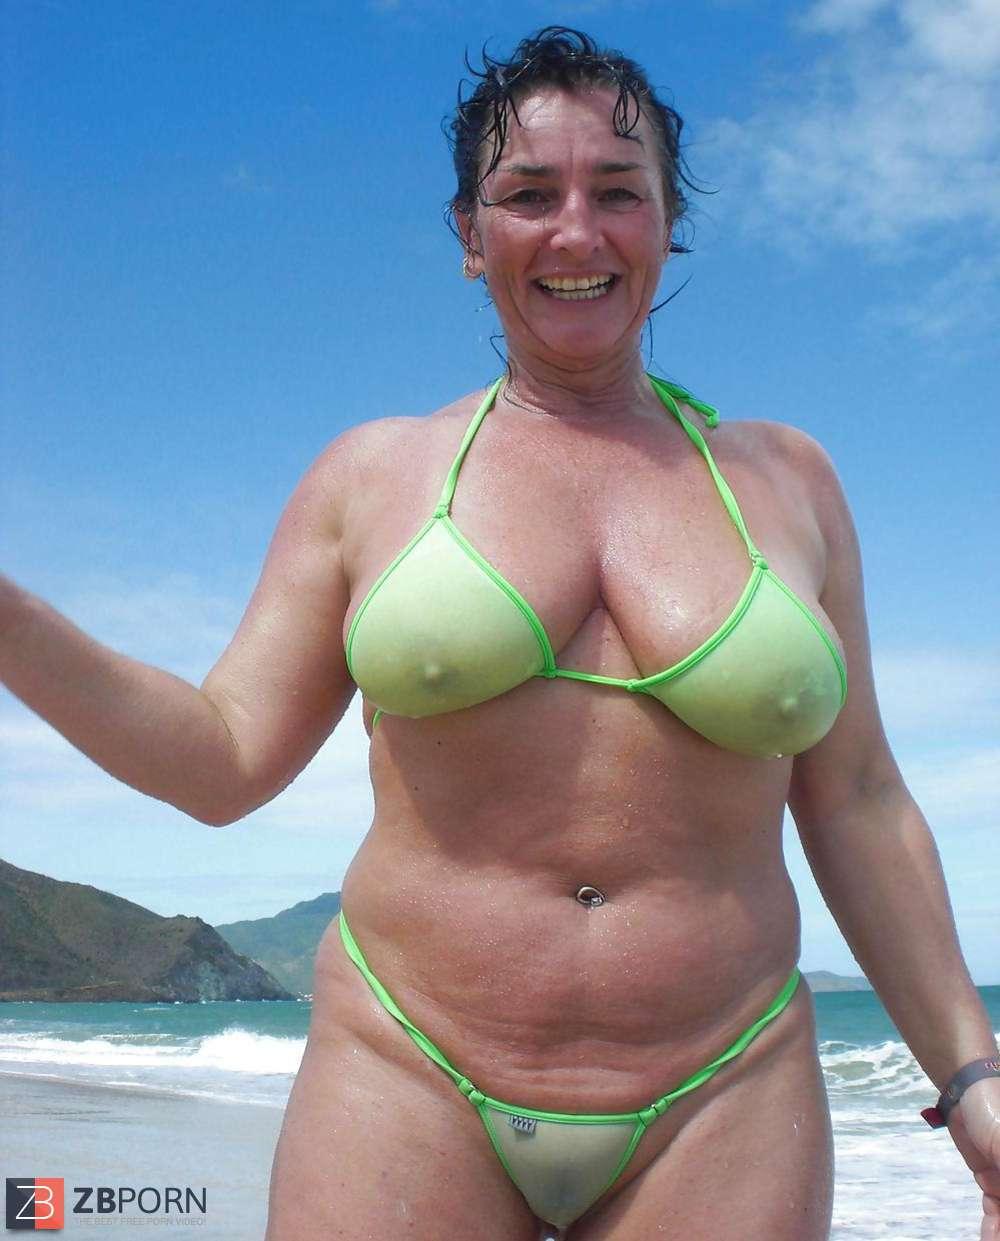 Hot B. reccomend candid bikini